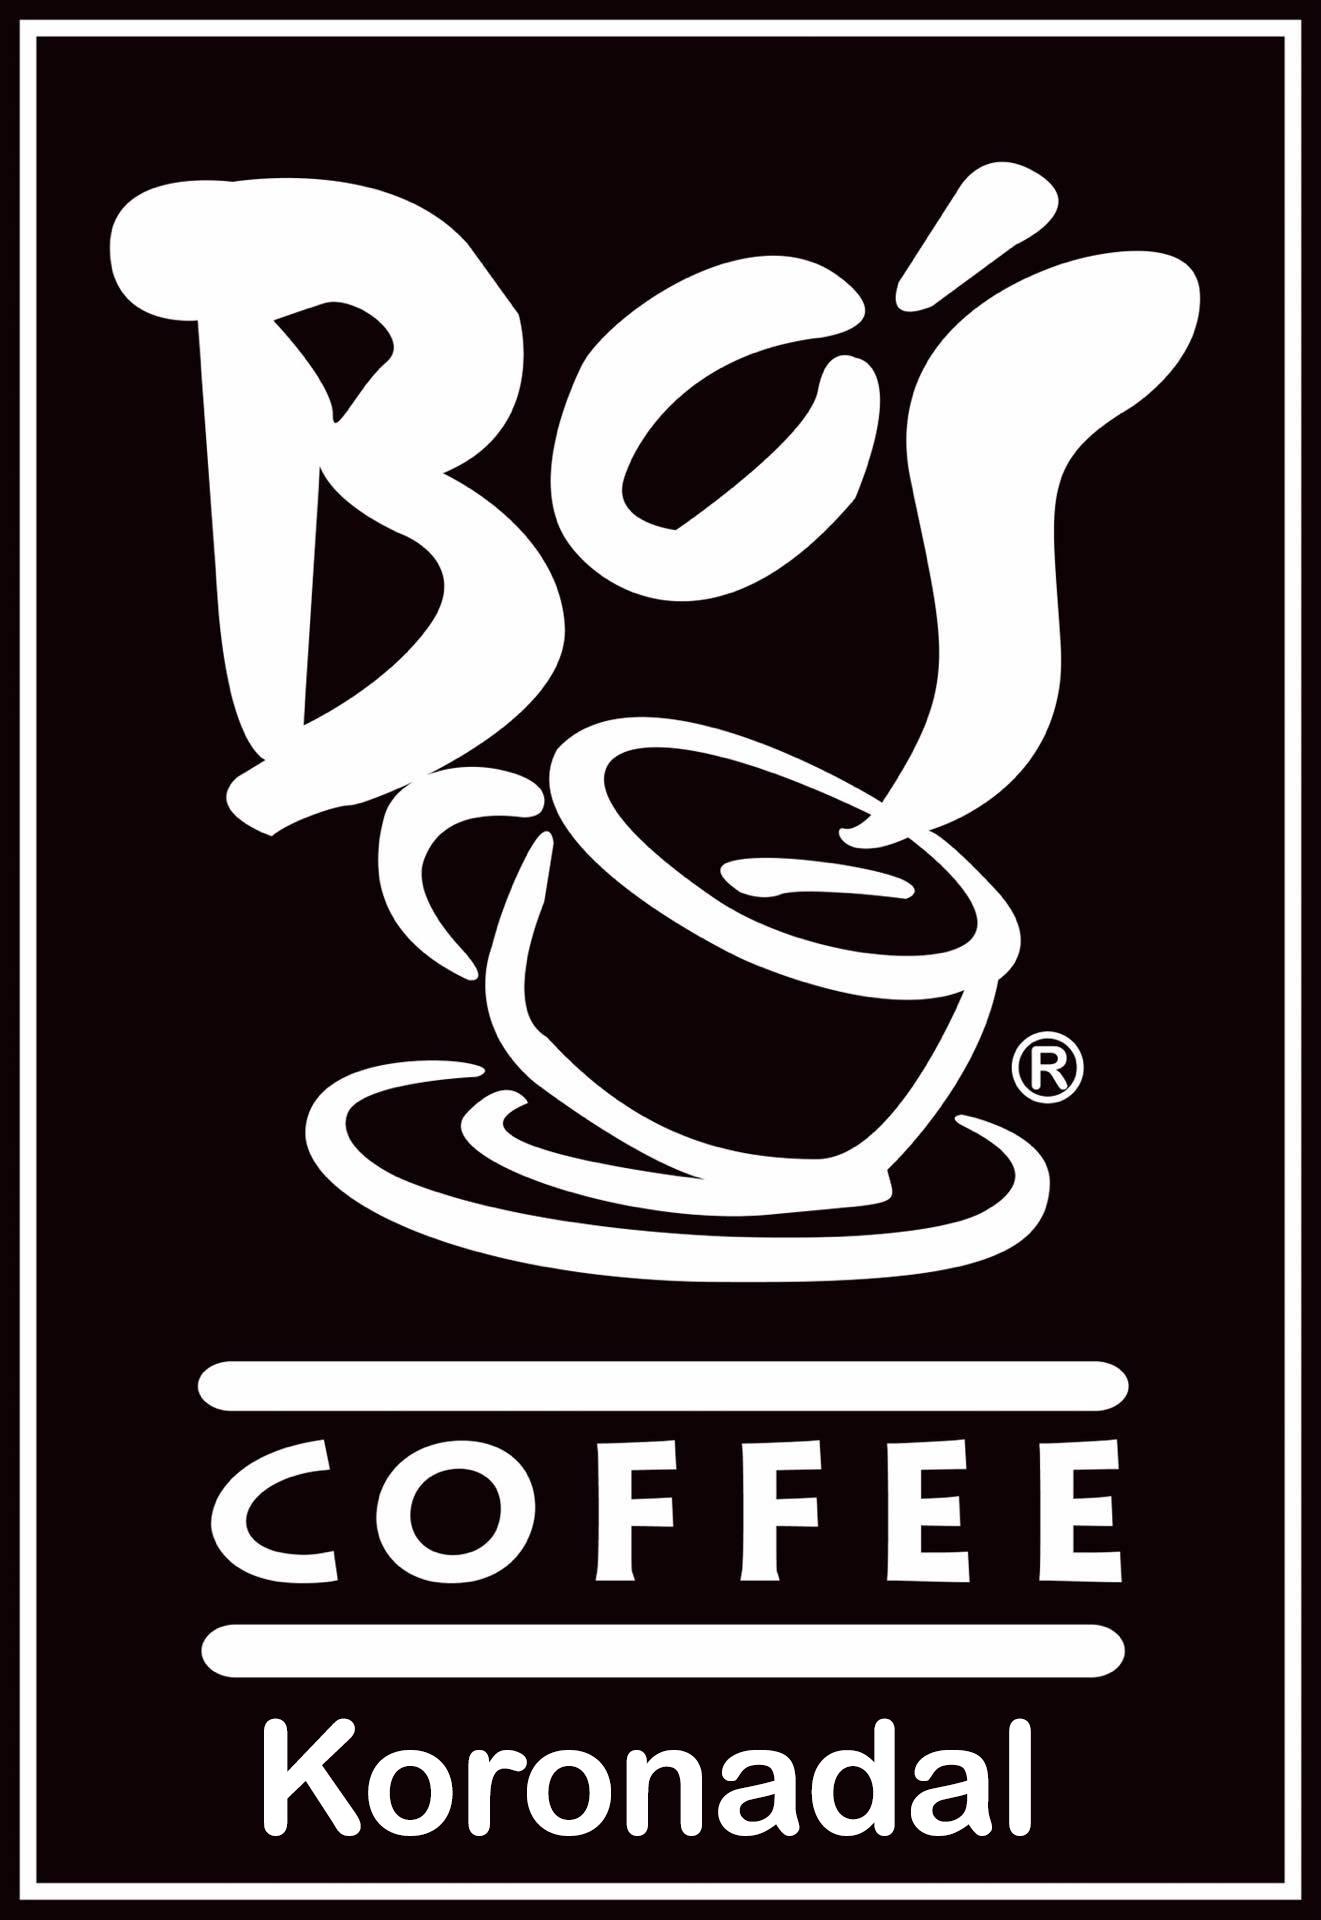 bo's coffee koronadal logo